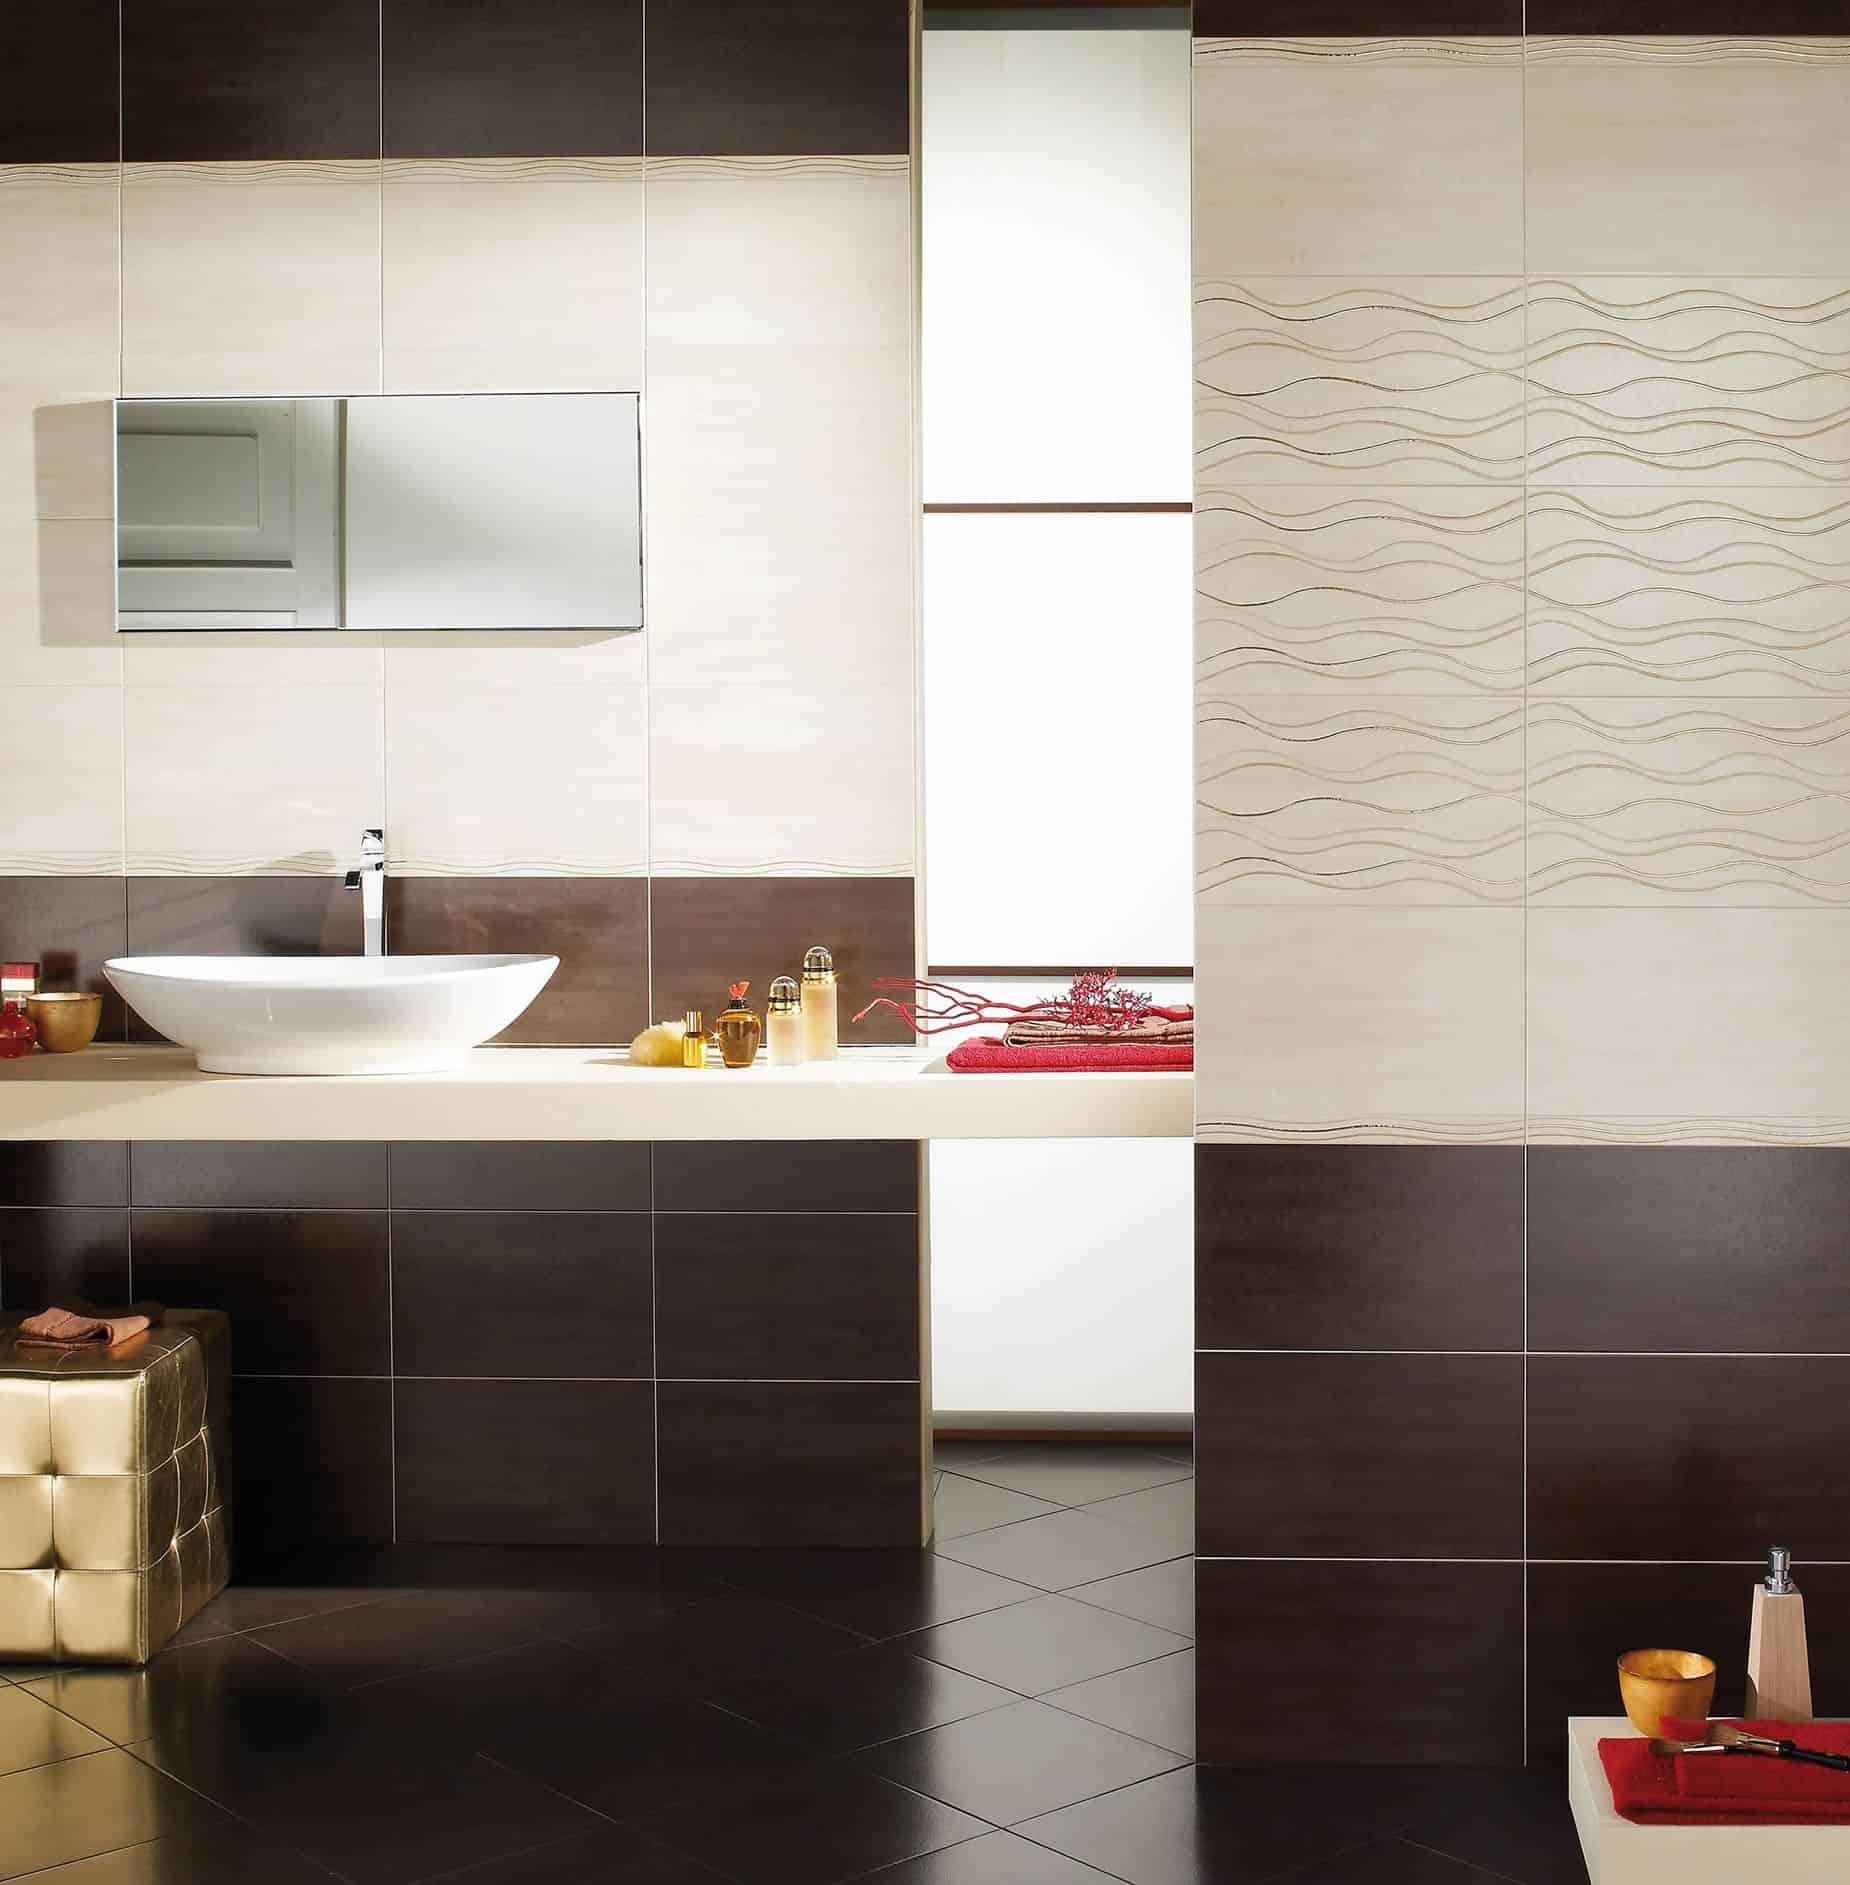 Salon De Jardin: Table Sonata 1m62/2m15/2m69/3m20 Graphite + 10 Fauteuils  Minesotta Graphite